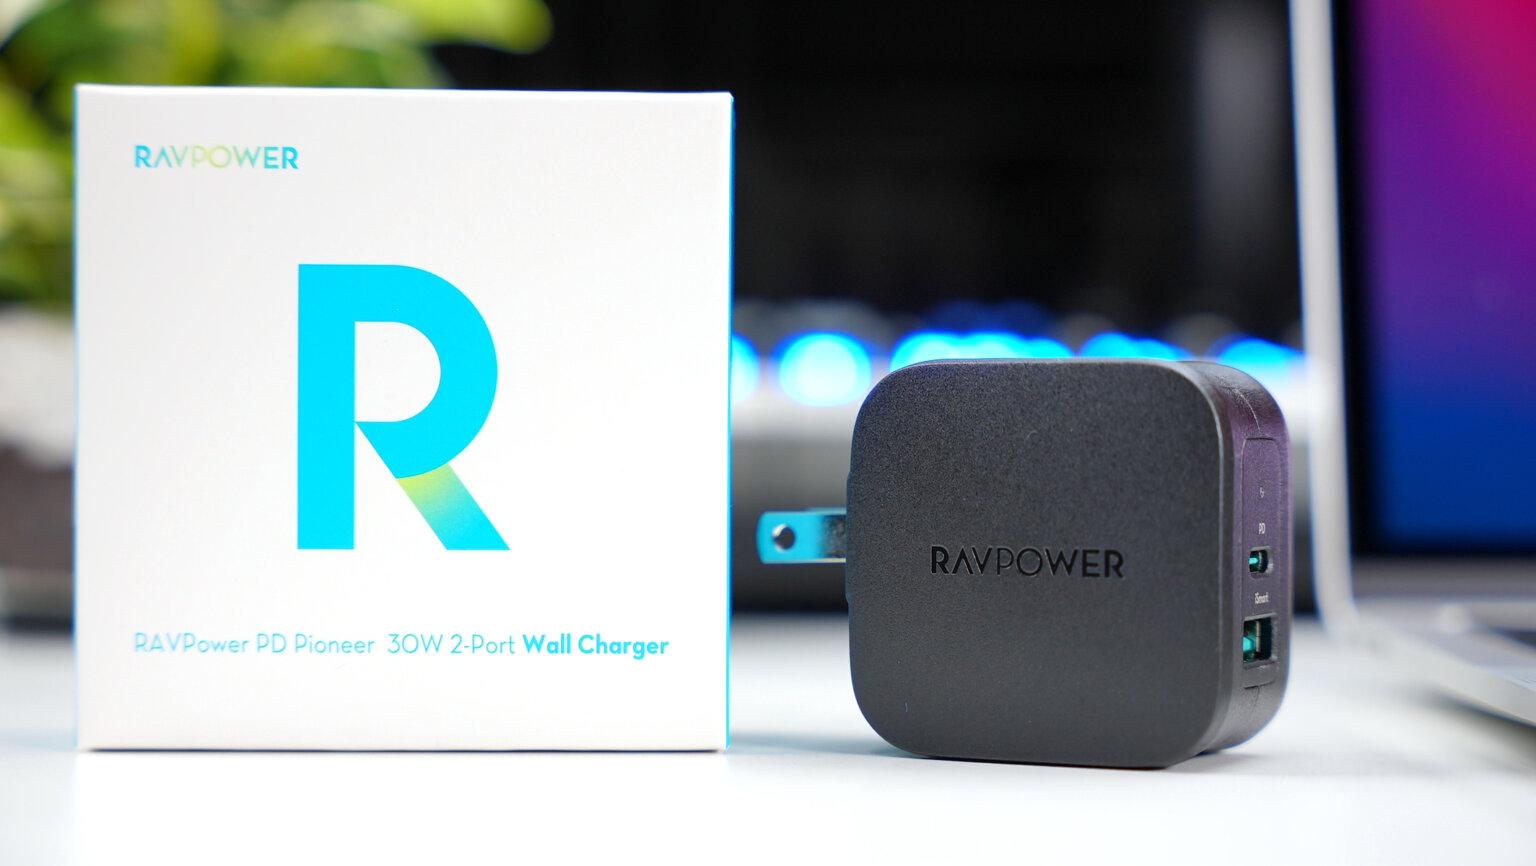 RAVPower RP-PC144 レビュー:小さいながらも最大30W出力!2ポート搭載のちょうどいいUSB充電器